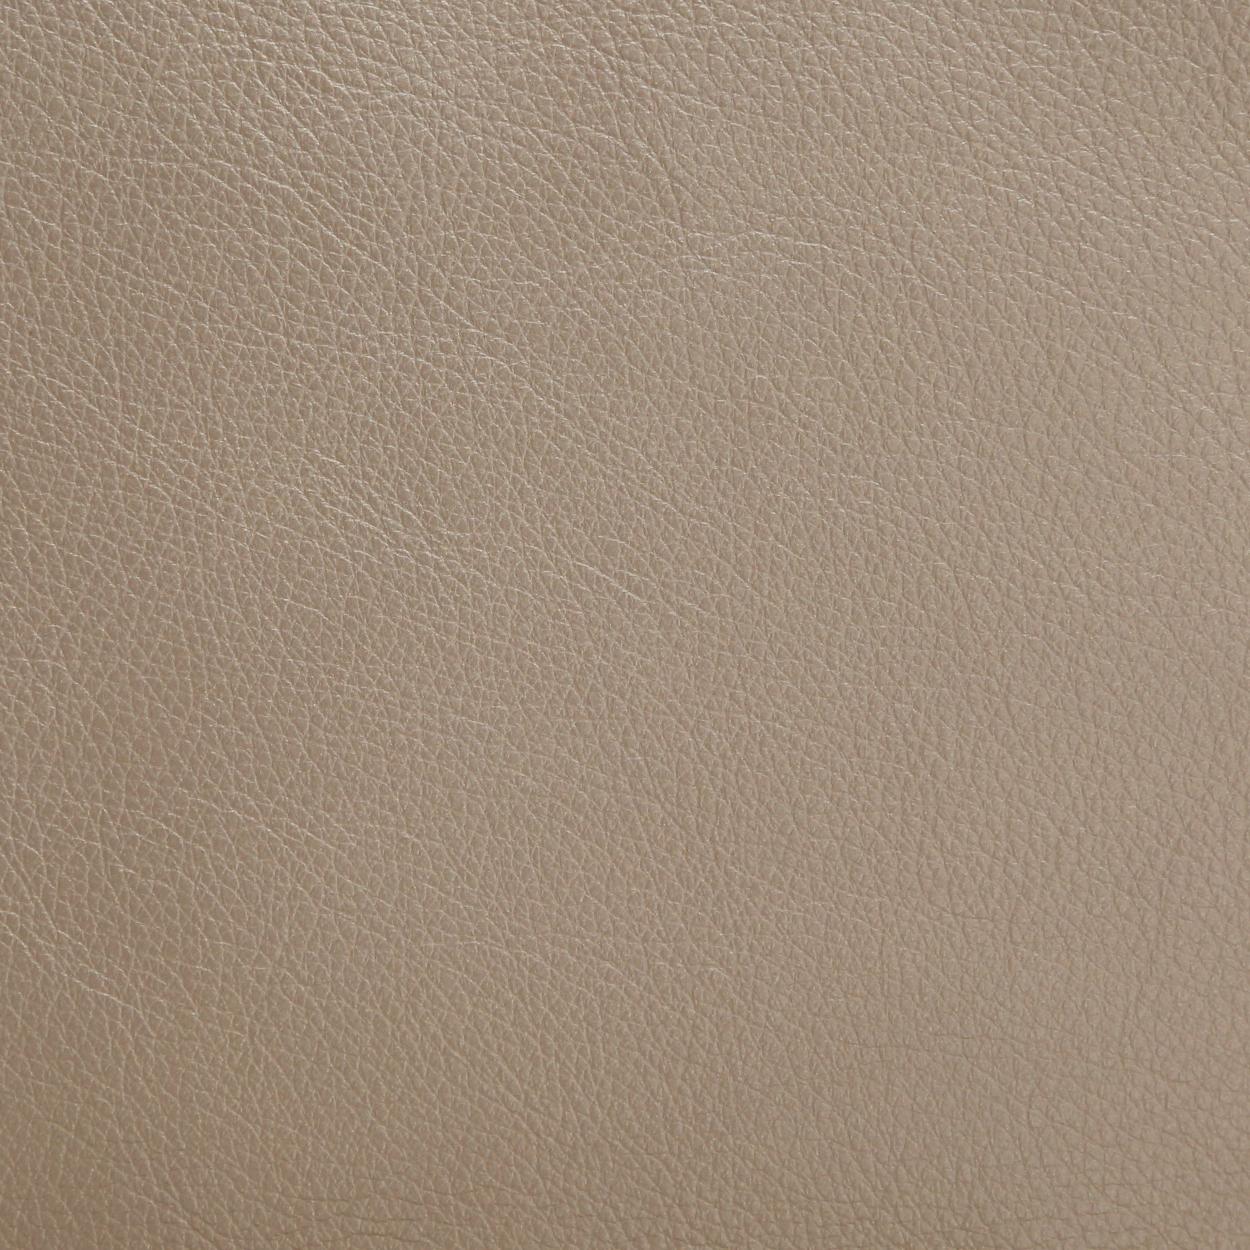 Leather-Pearlescent-Diamond